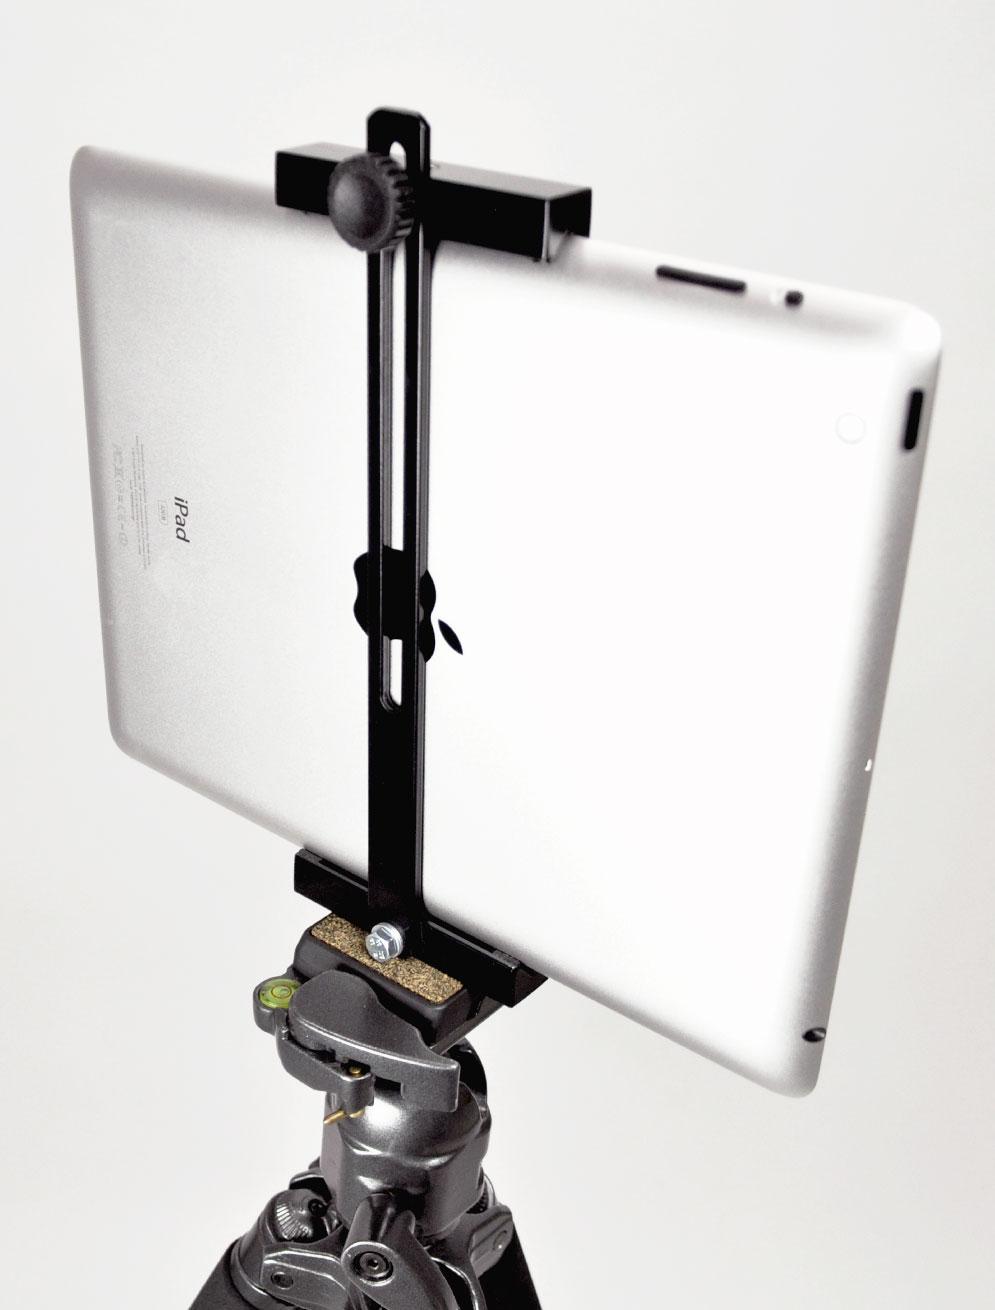 hague utm universal tablet mount - Tablet Mount